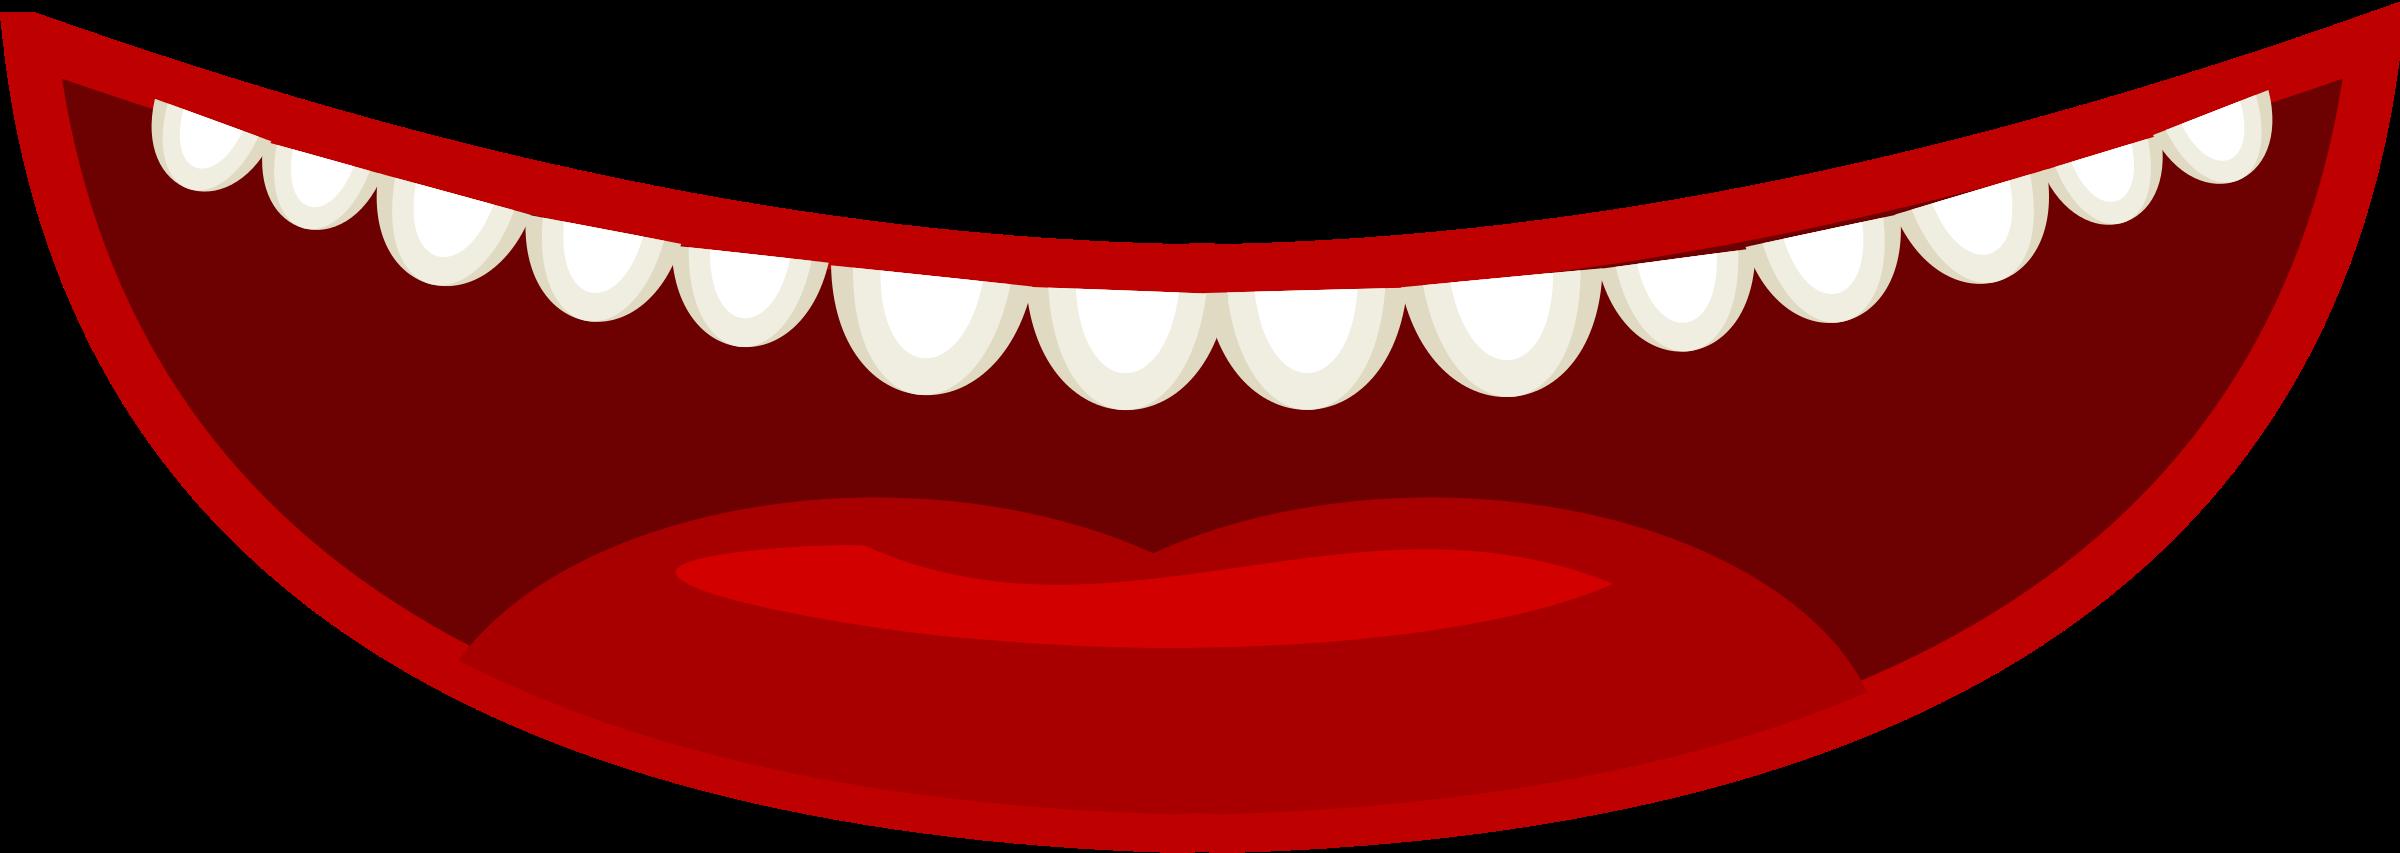 Smile teeth clipart 3